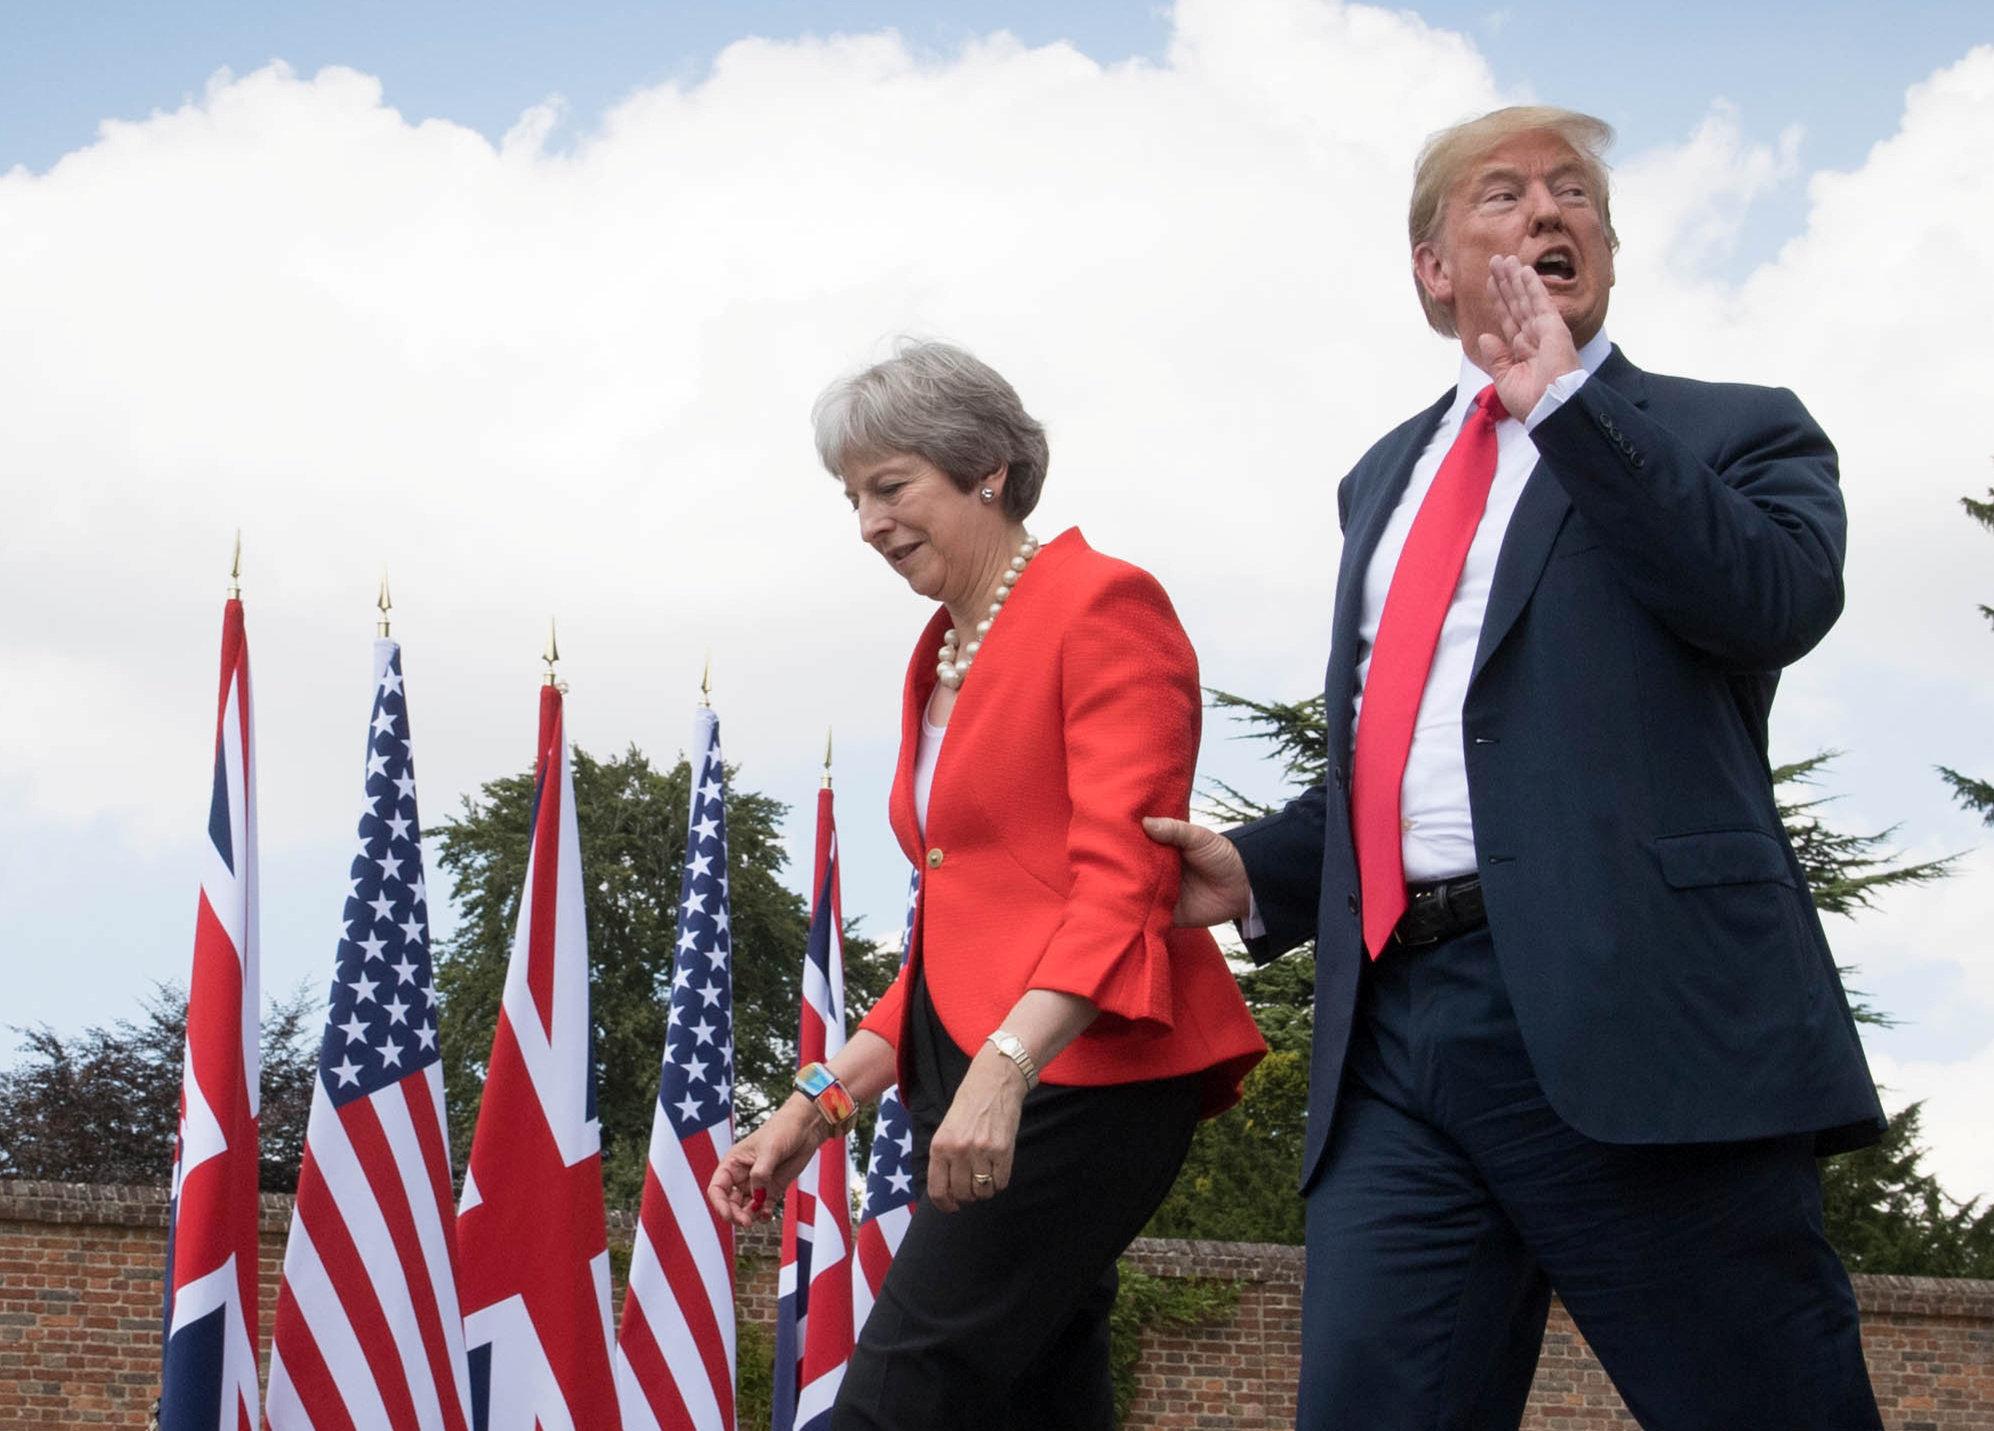 huffingtonpost.com - Jason Cherkis - Donald Trump Declares The European Union A 'Foe'